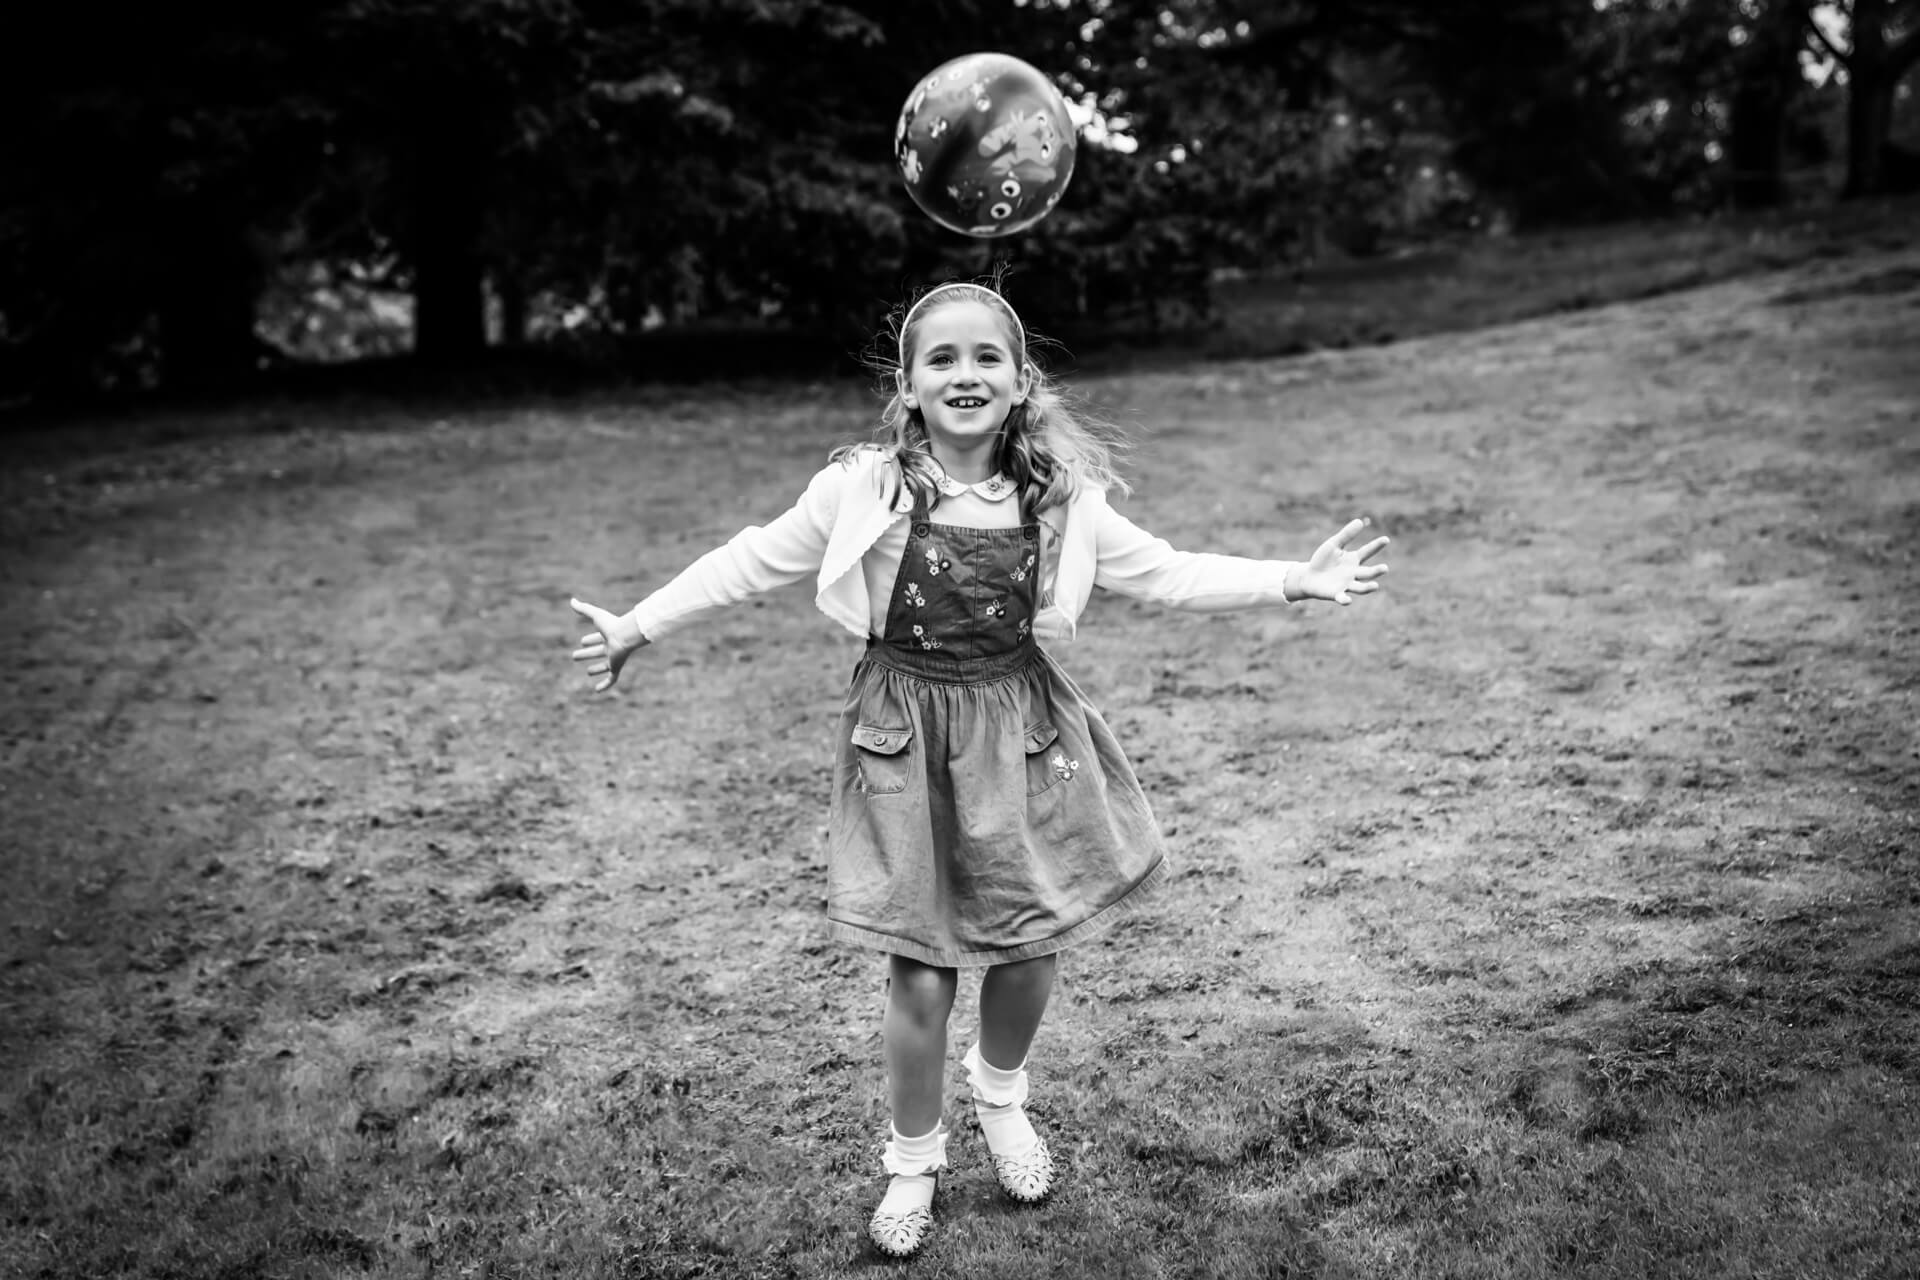 girl throwing a ball